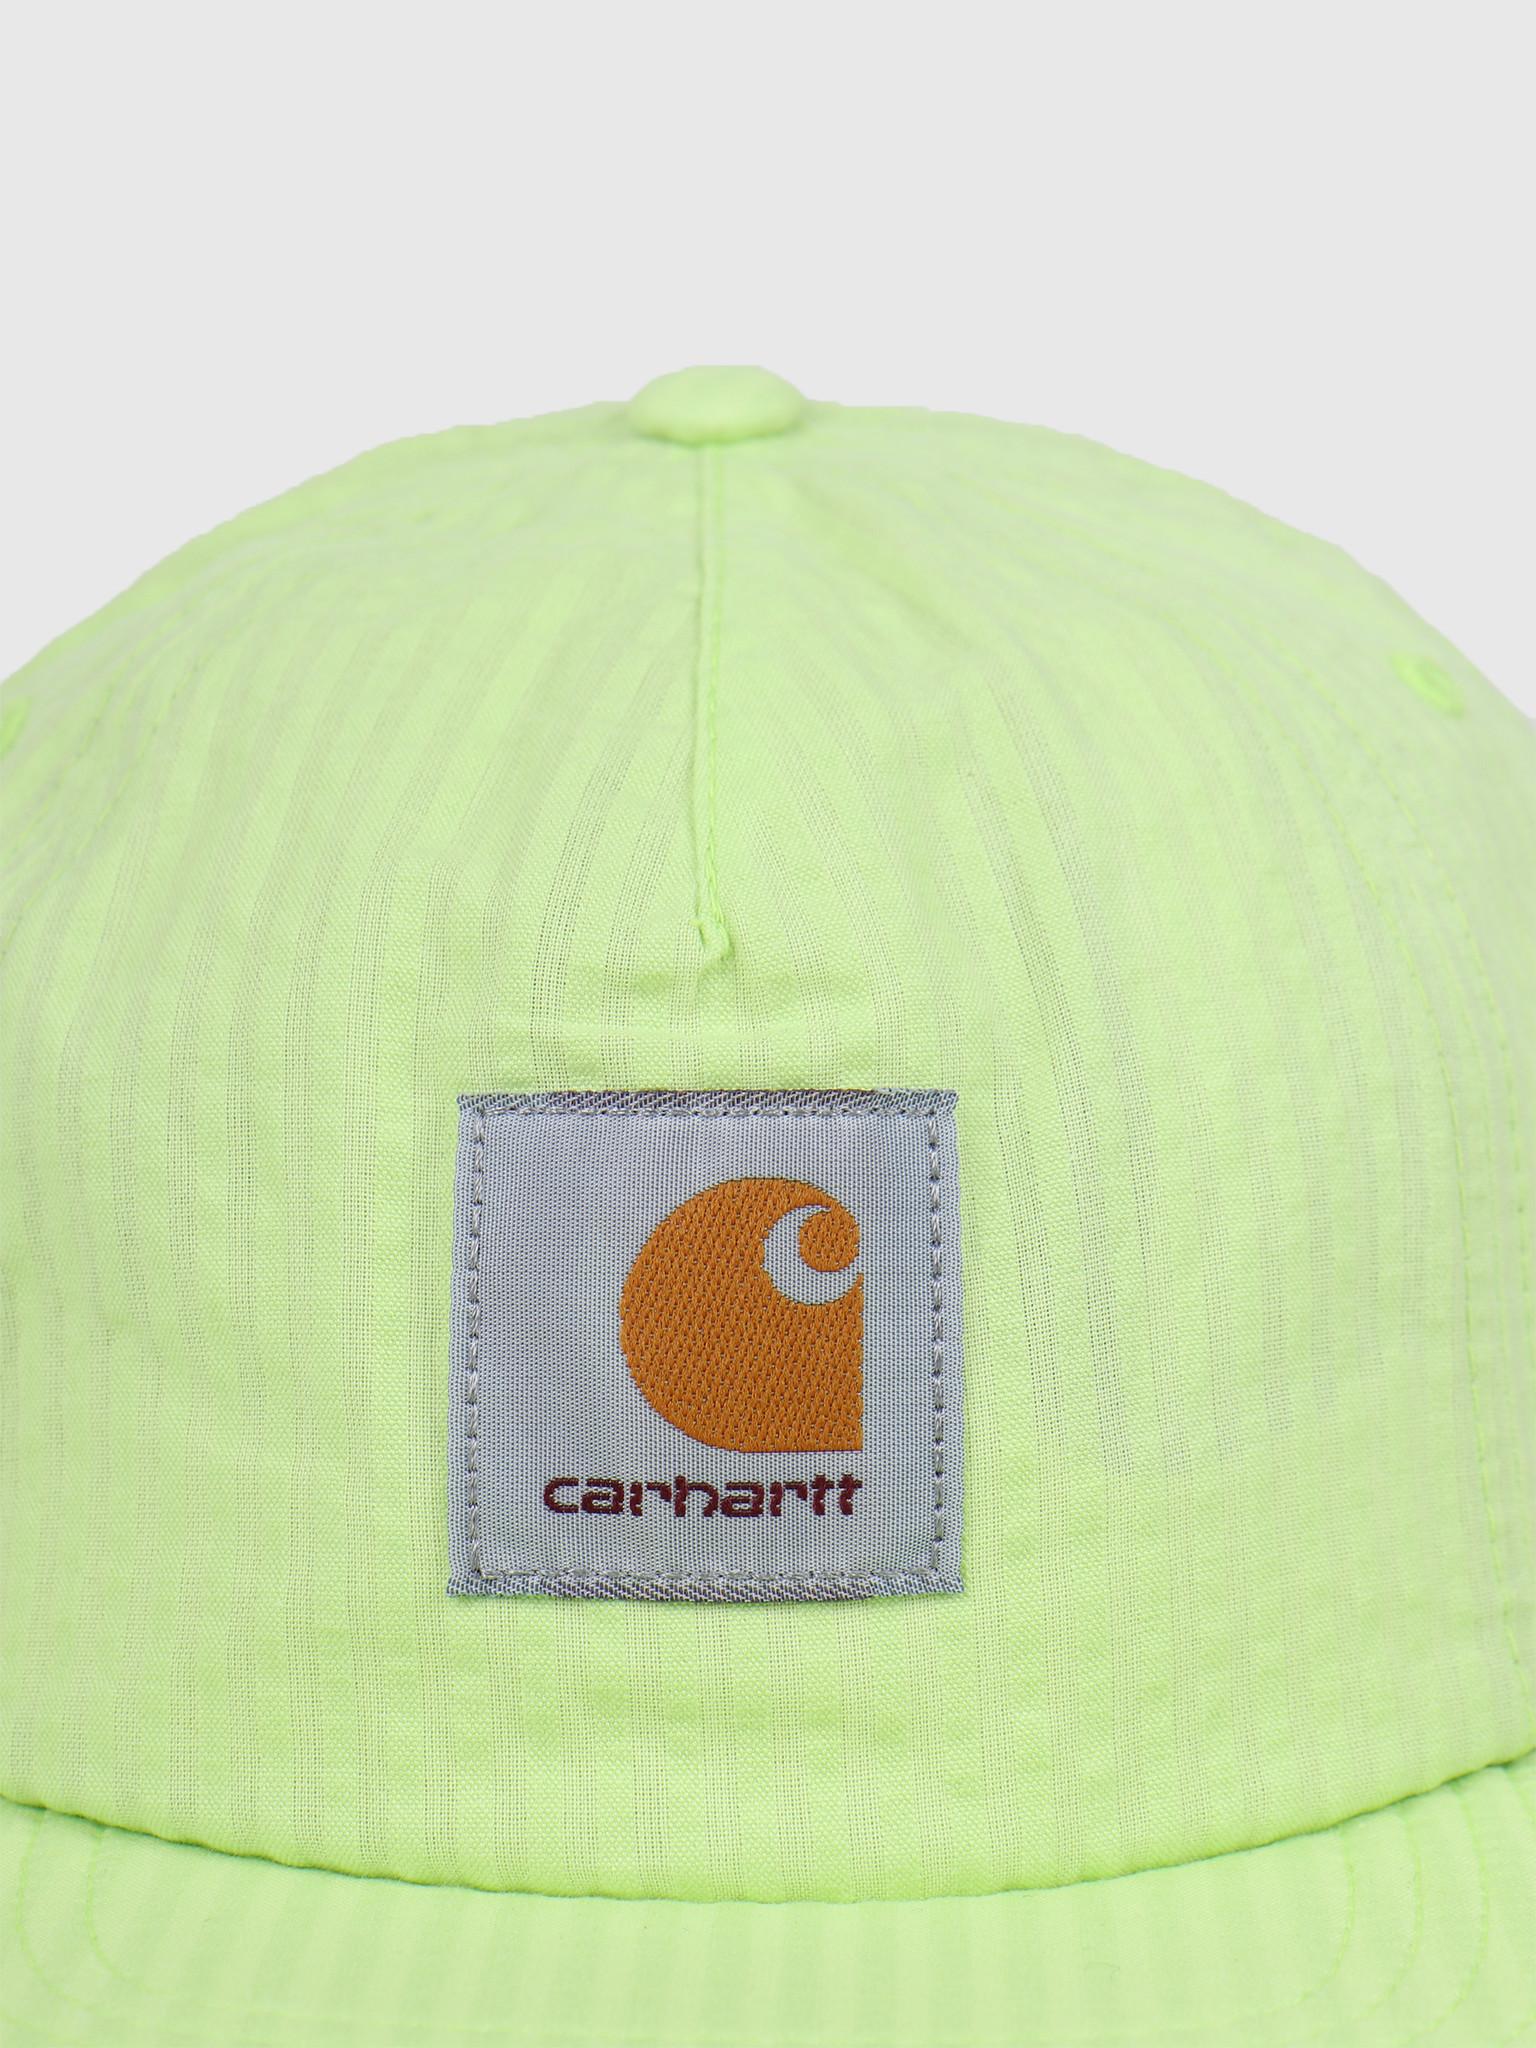 Carhartt WIP Carhartt WIP Southfield Cap Lime I027609-09E00